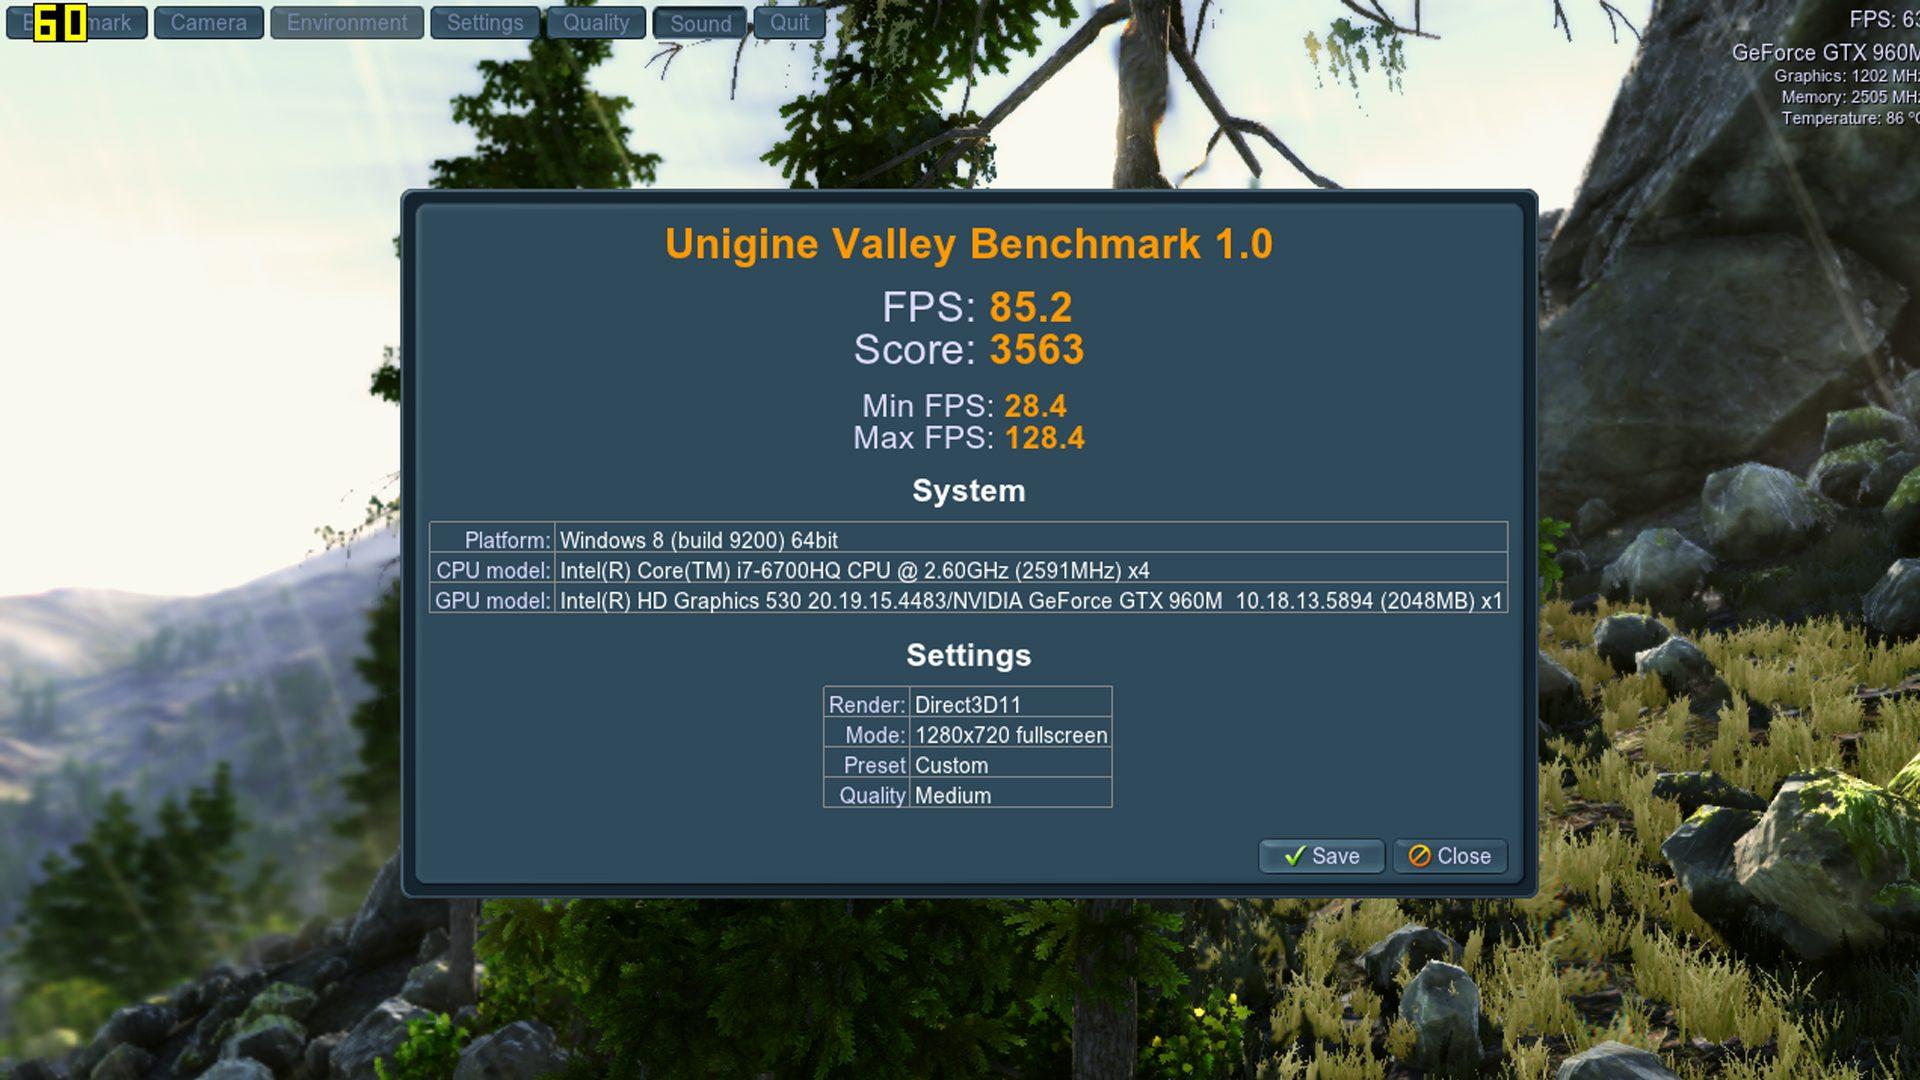 Dell-XPS-15-9550-3813-Ultrabook-Grafik_1